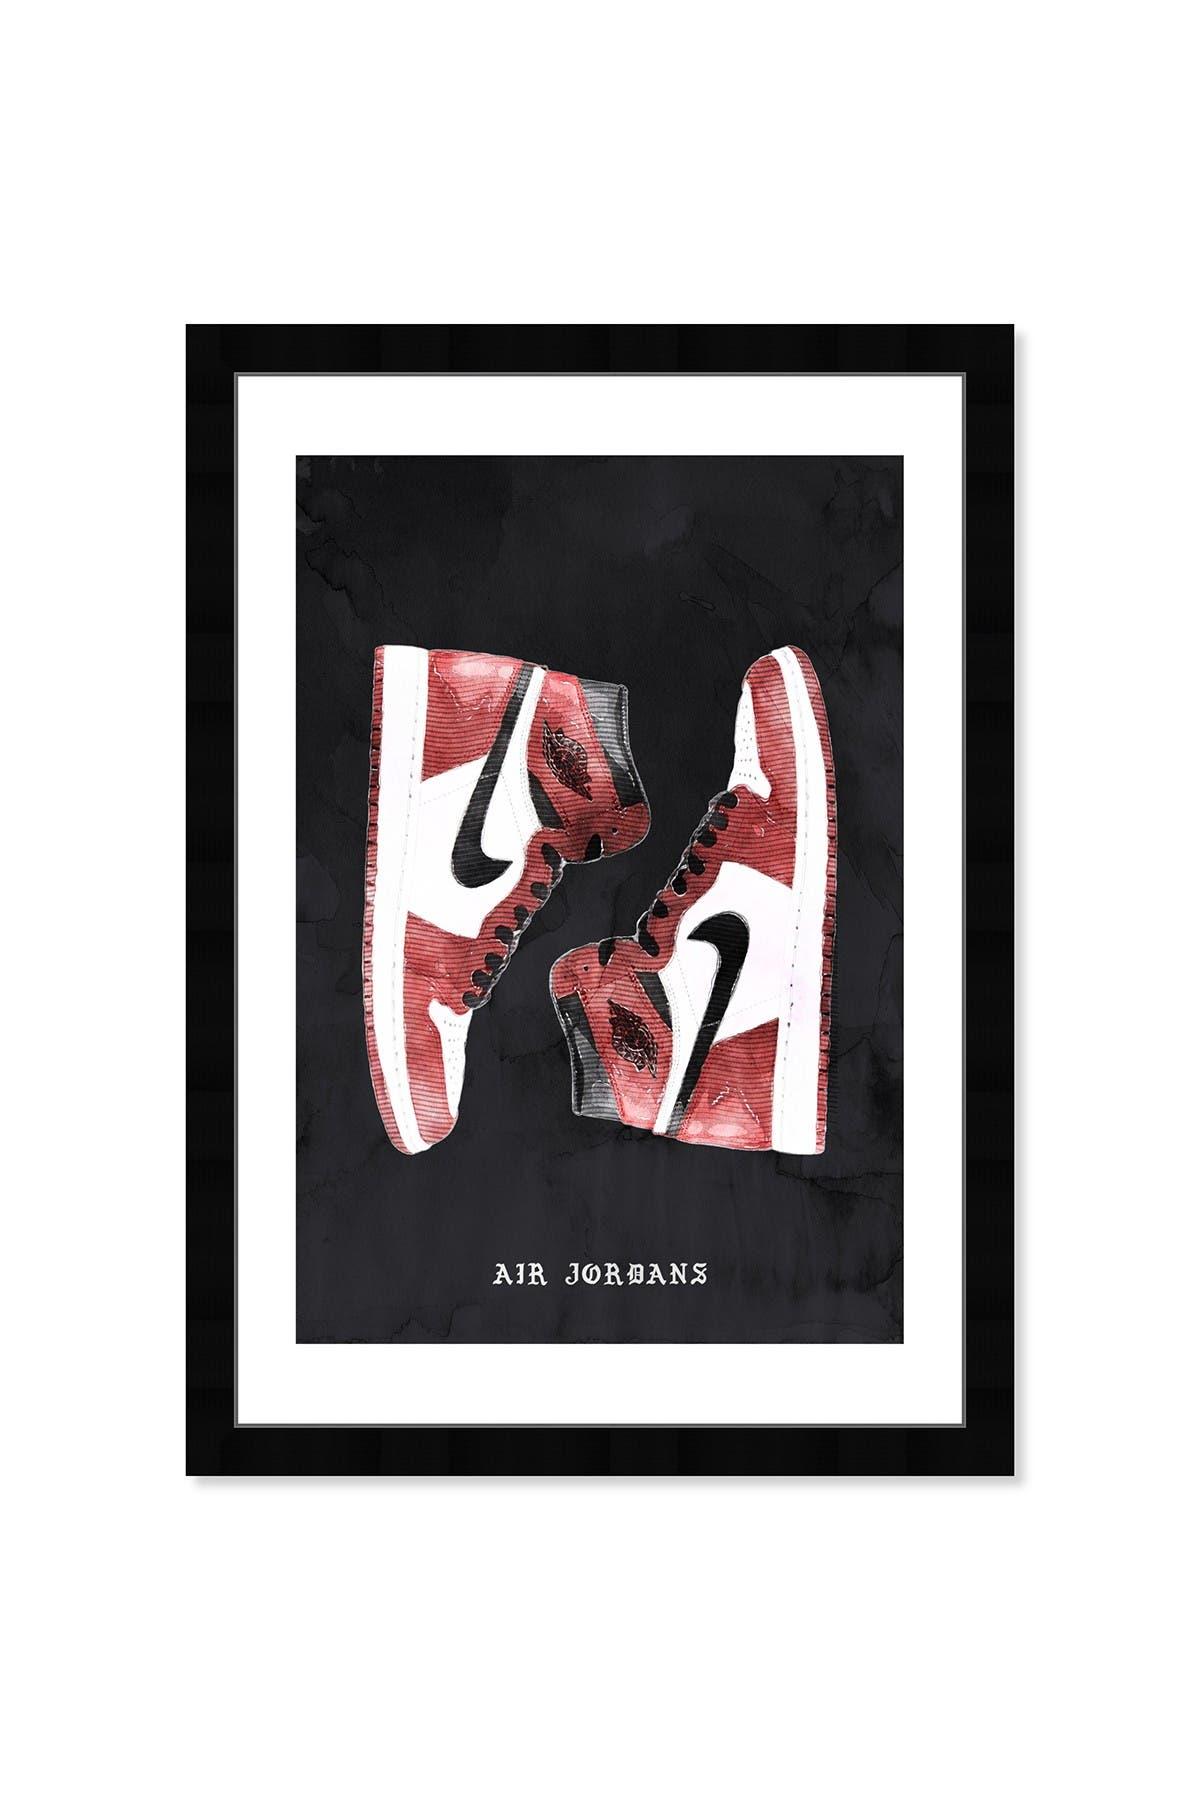 Image of Wynwood Studio Classic Sneakers Framed Art